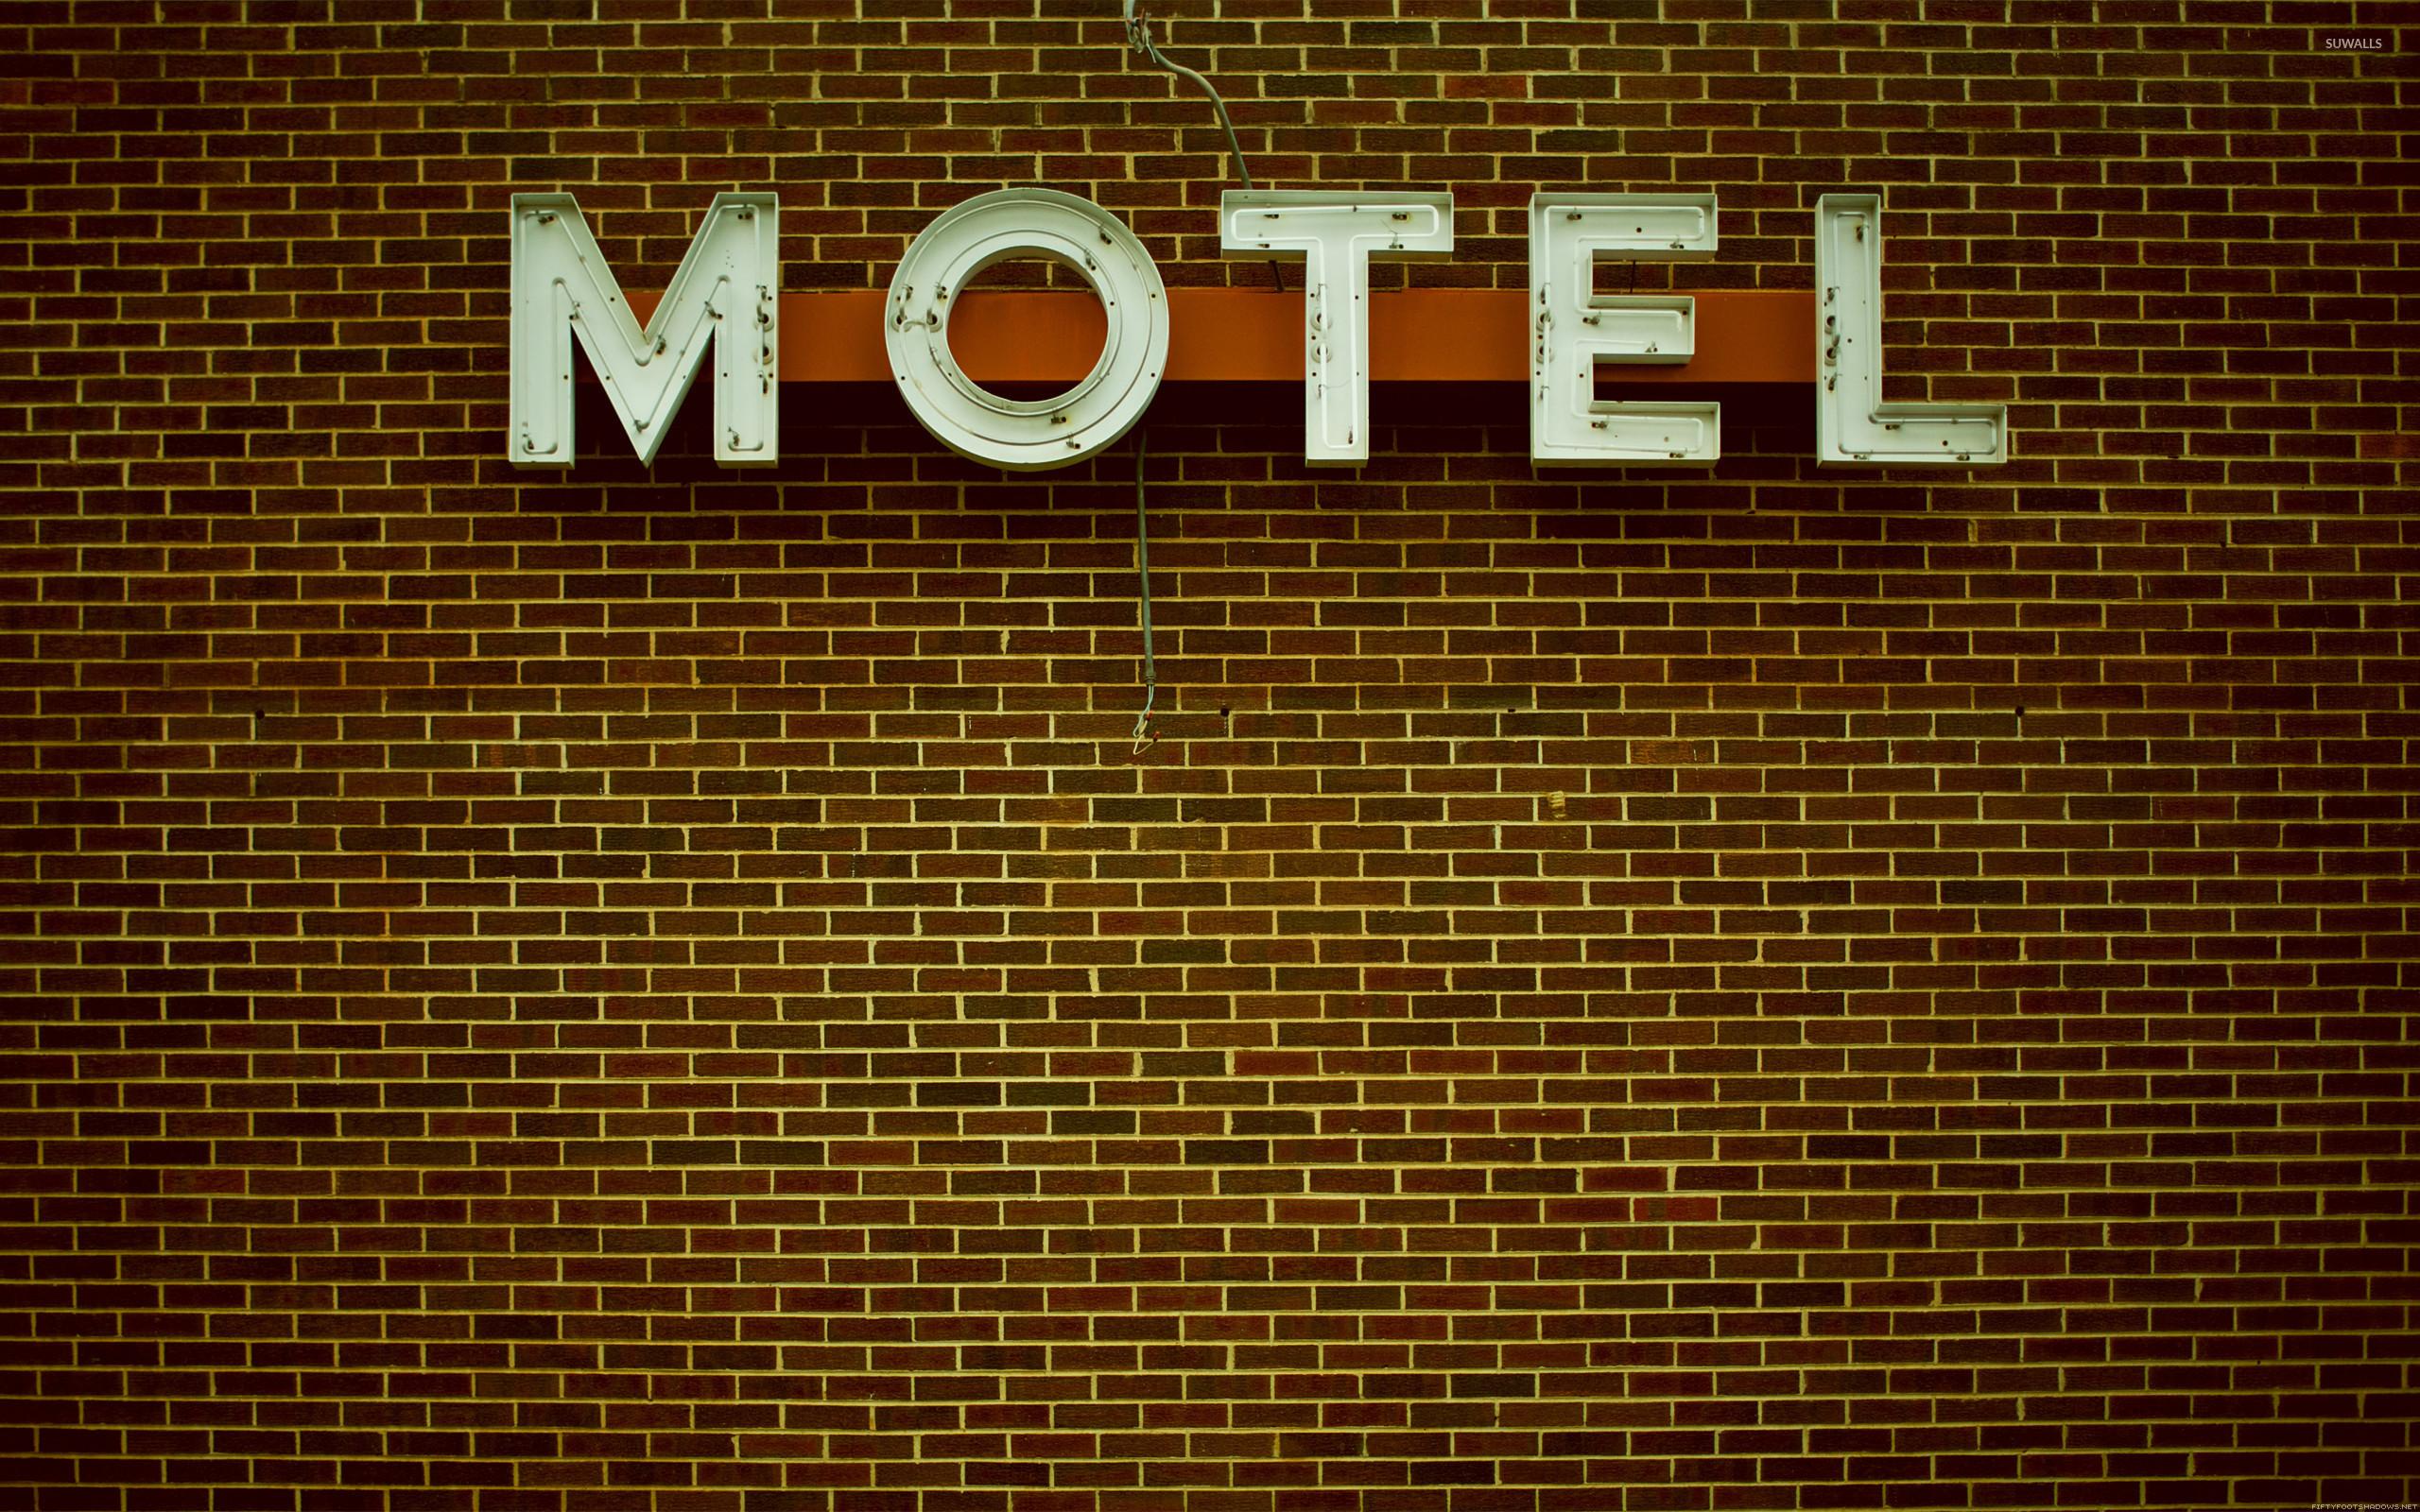 Old Motel sign wallpaper